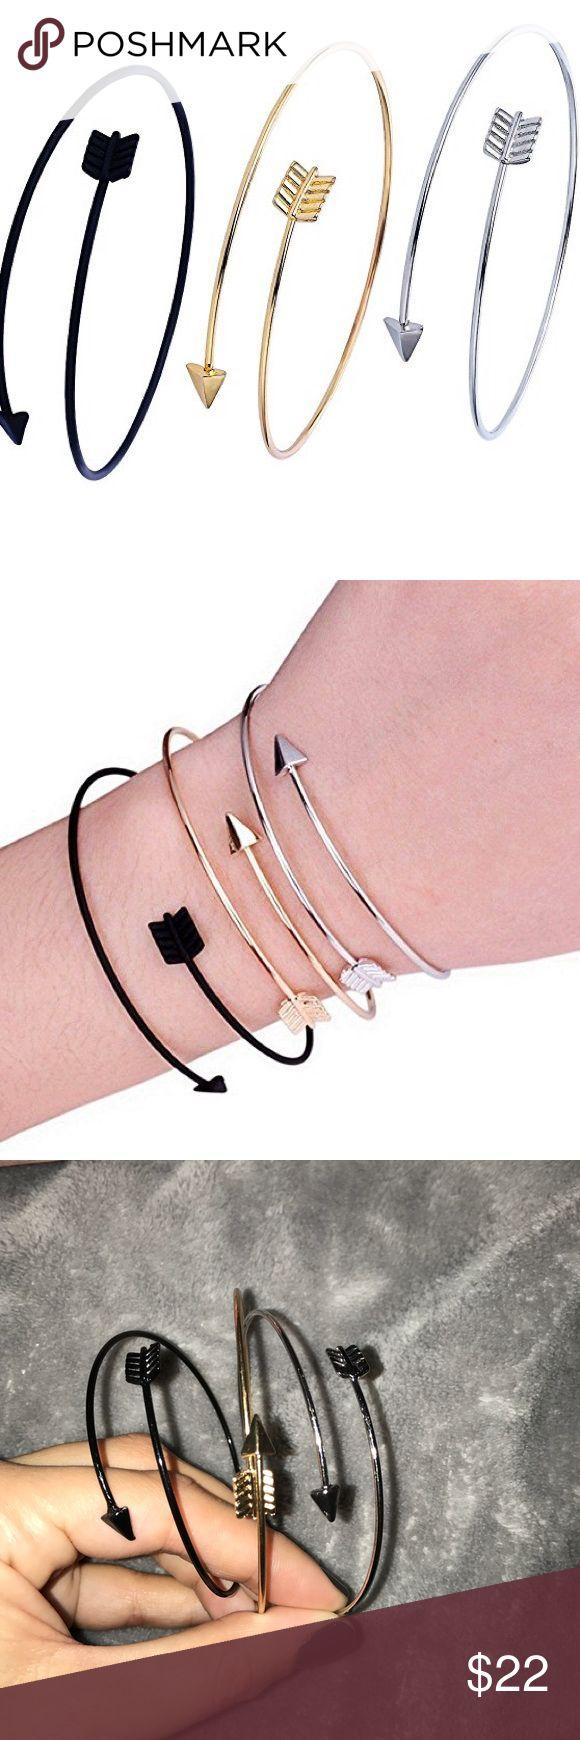 Set of 3 arrow arm cuffs Arrow bracelets in black gold and silver. NWOT Jewelry Bracelets